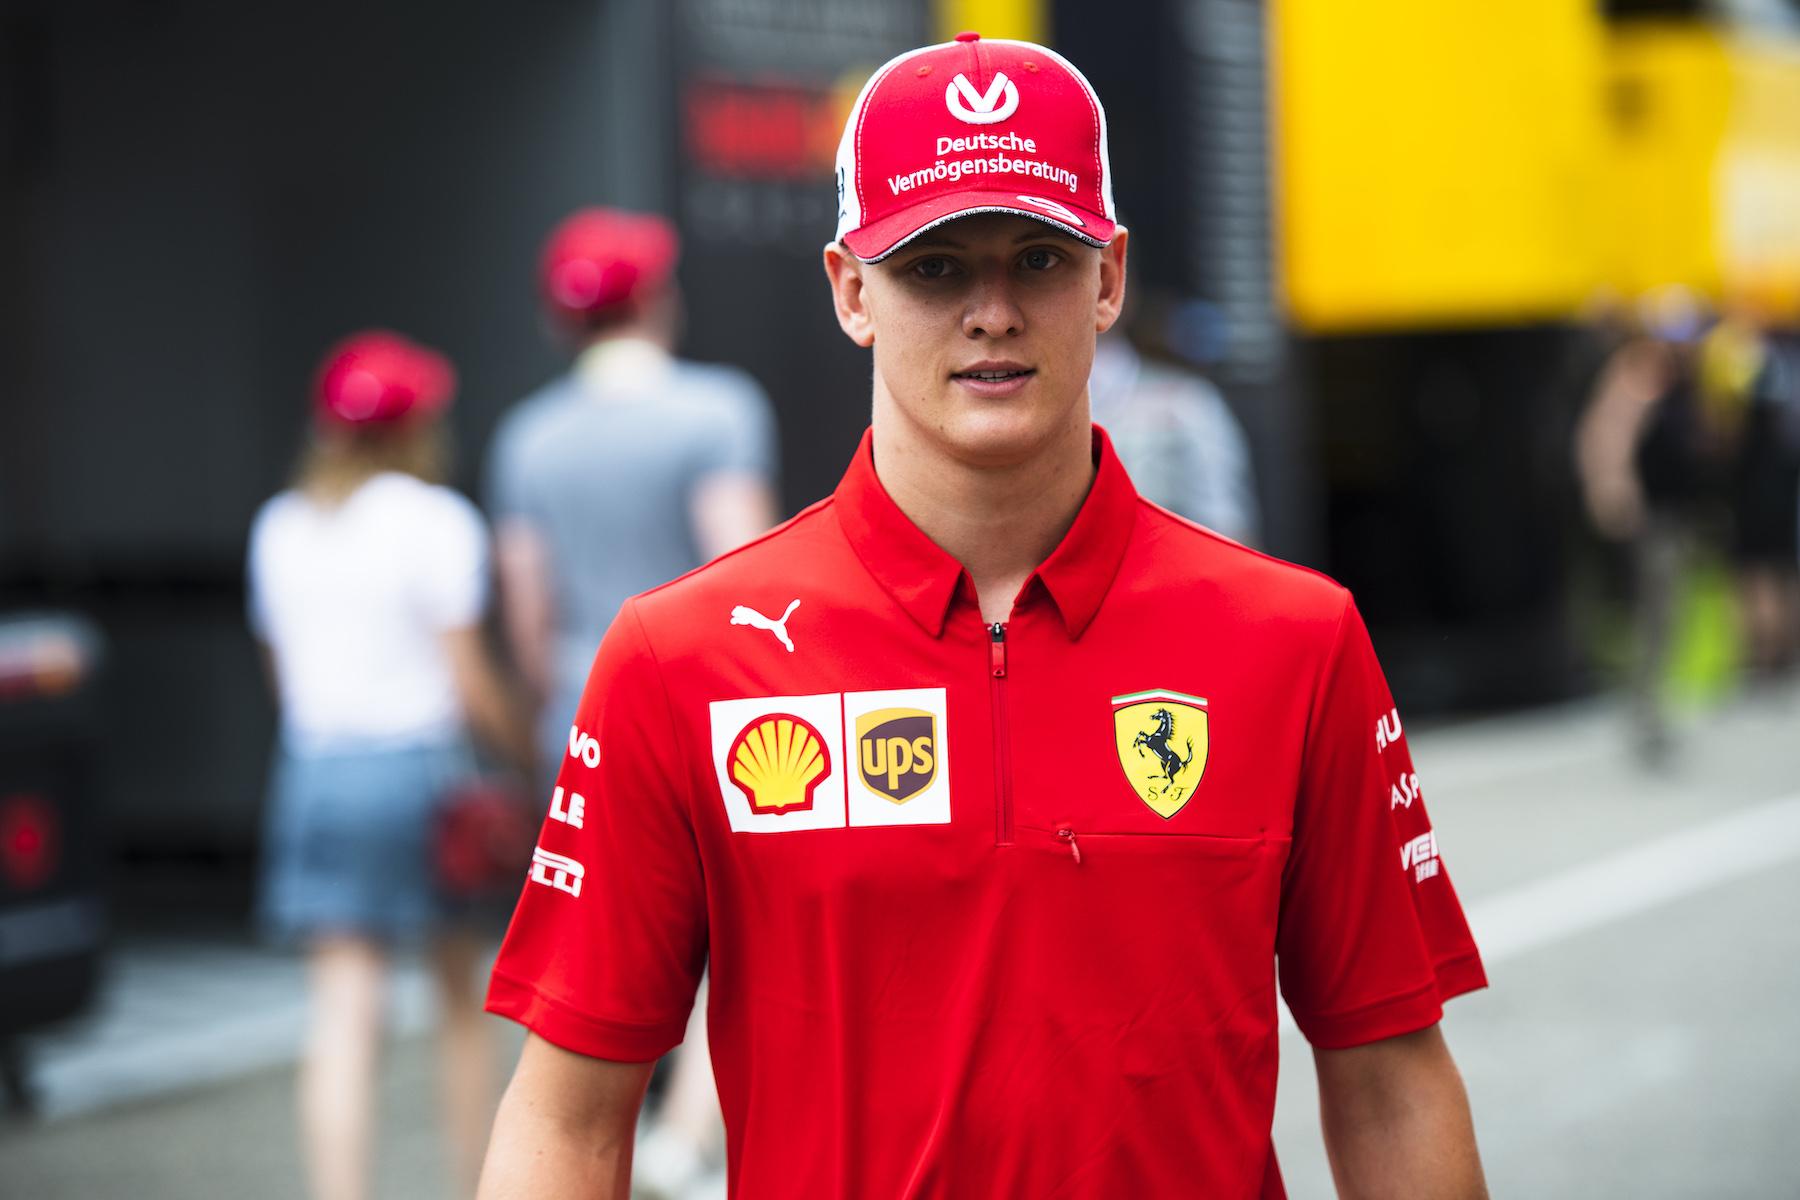 2019 Mick Schumacher | Ferrari F2004 | 2019 German GP 1 copy.jpg